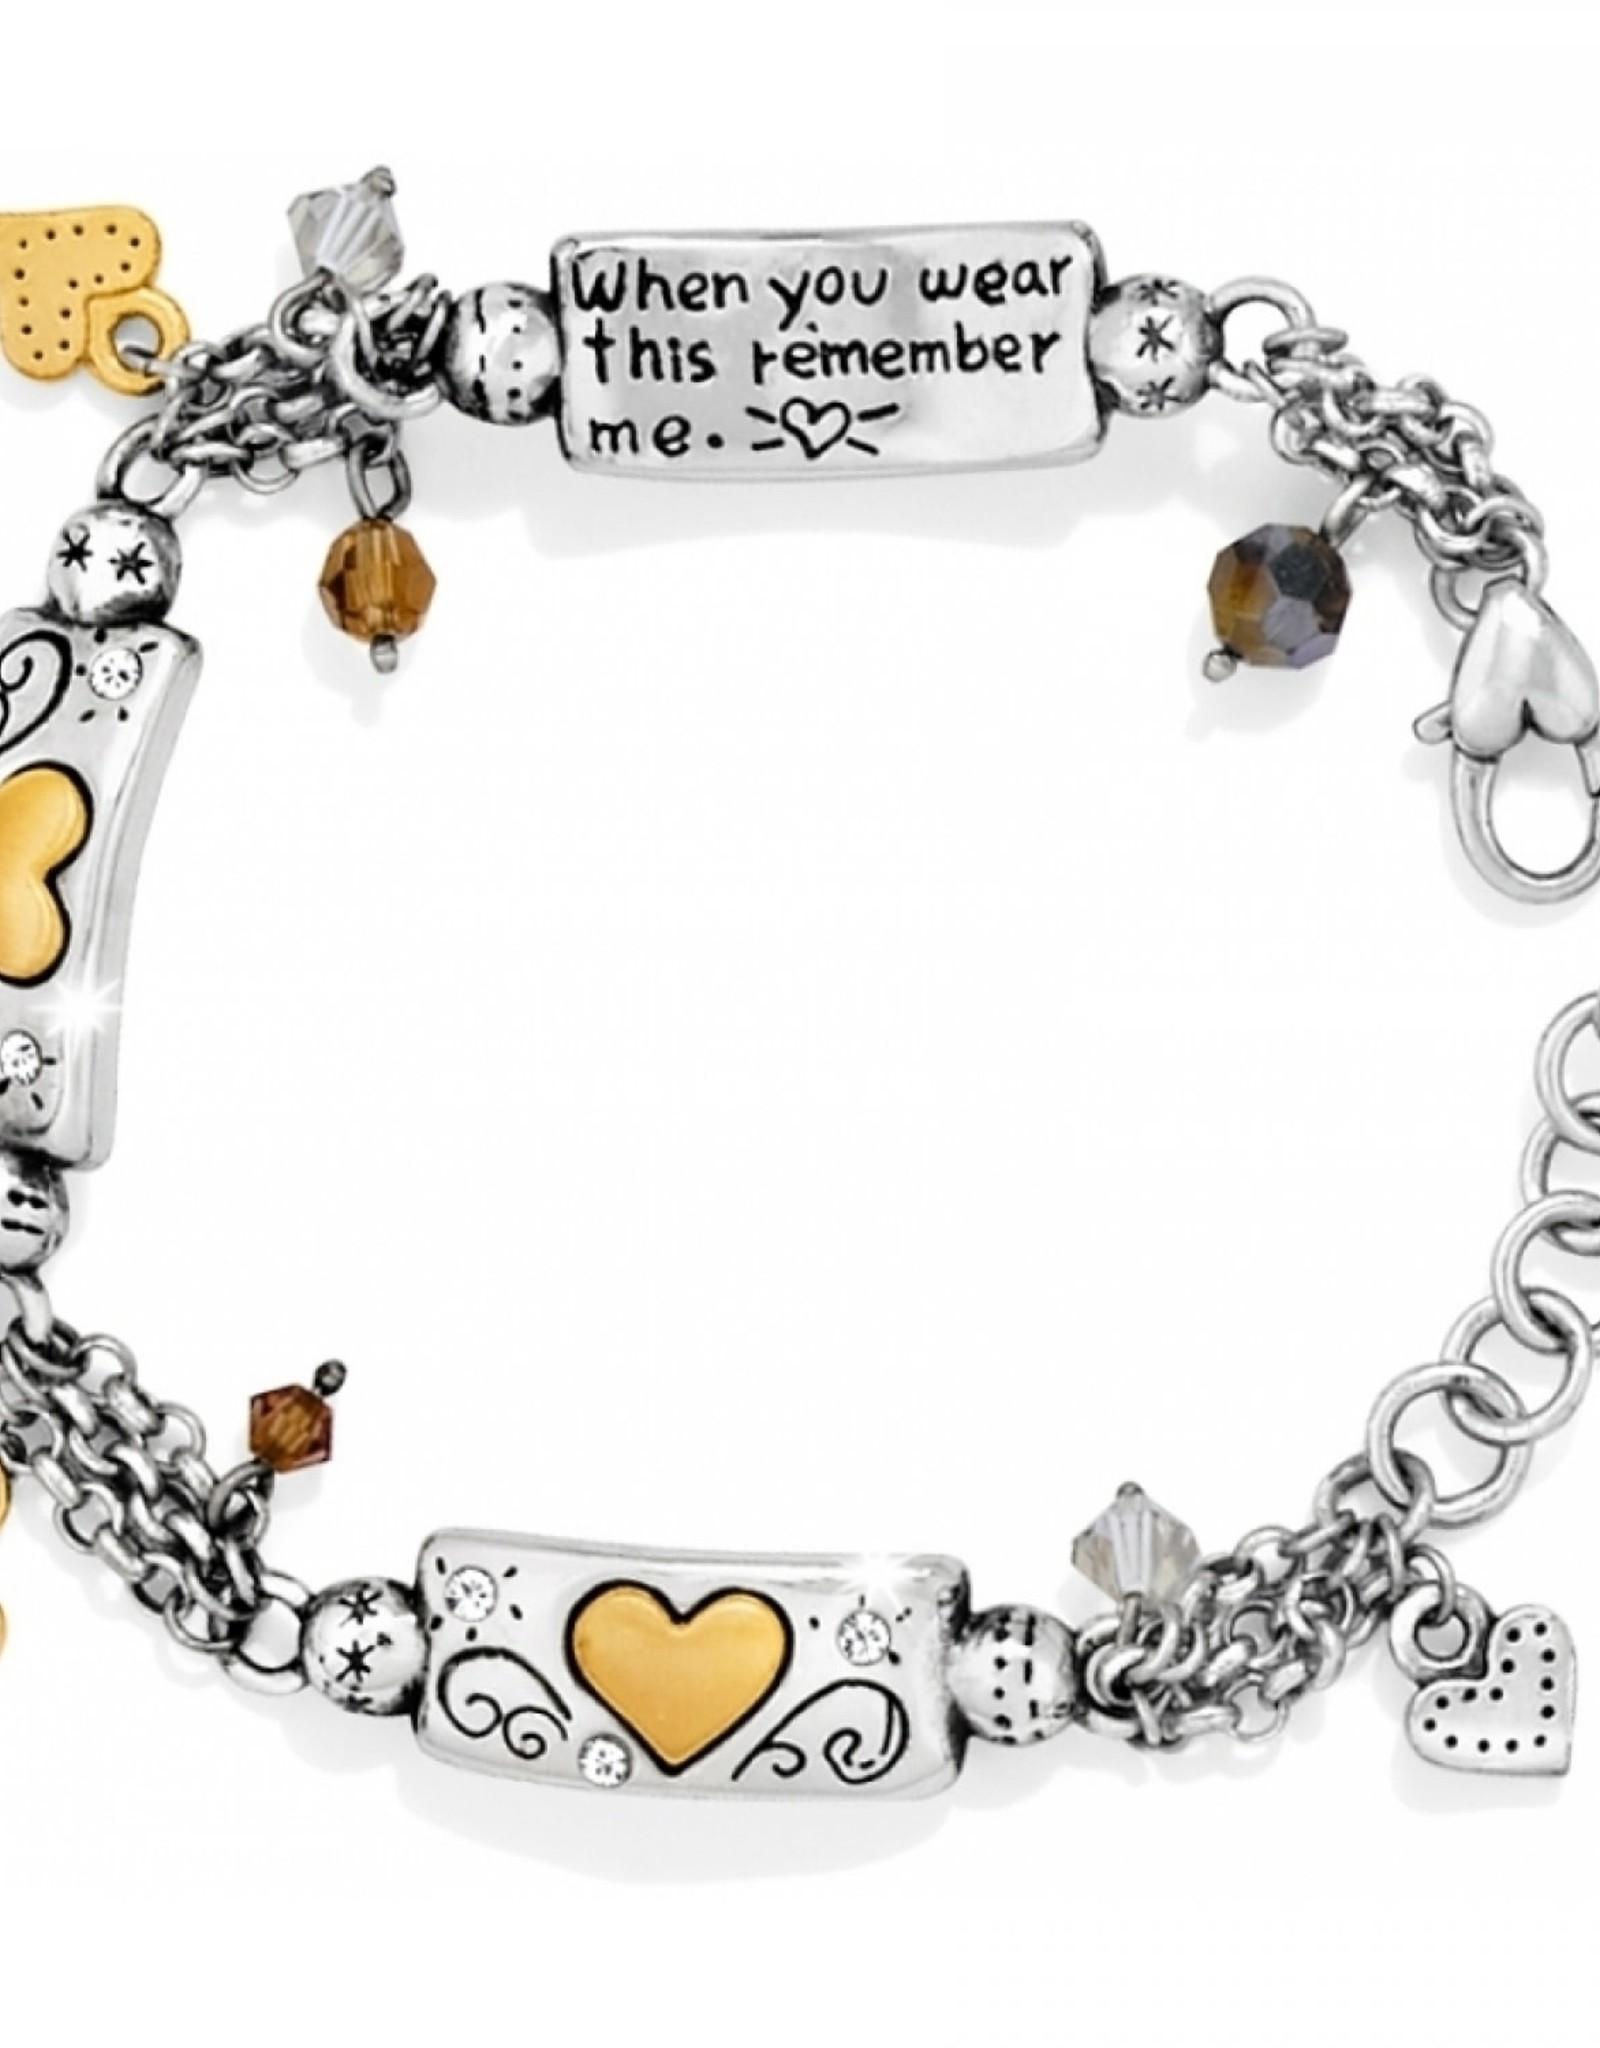 Brighton Brighton, Remember Your Heart Bracelet